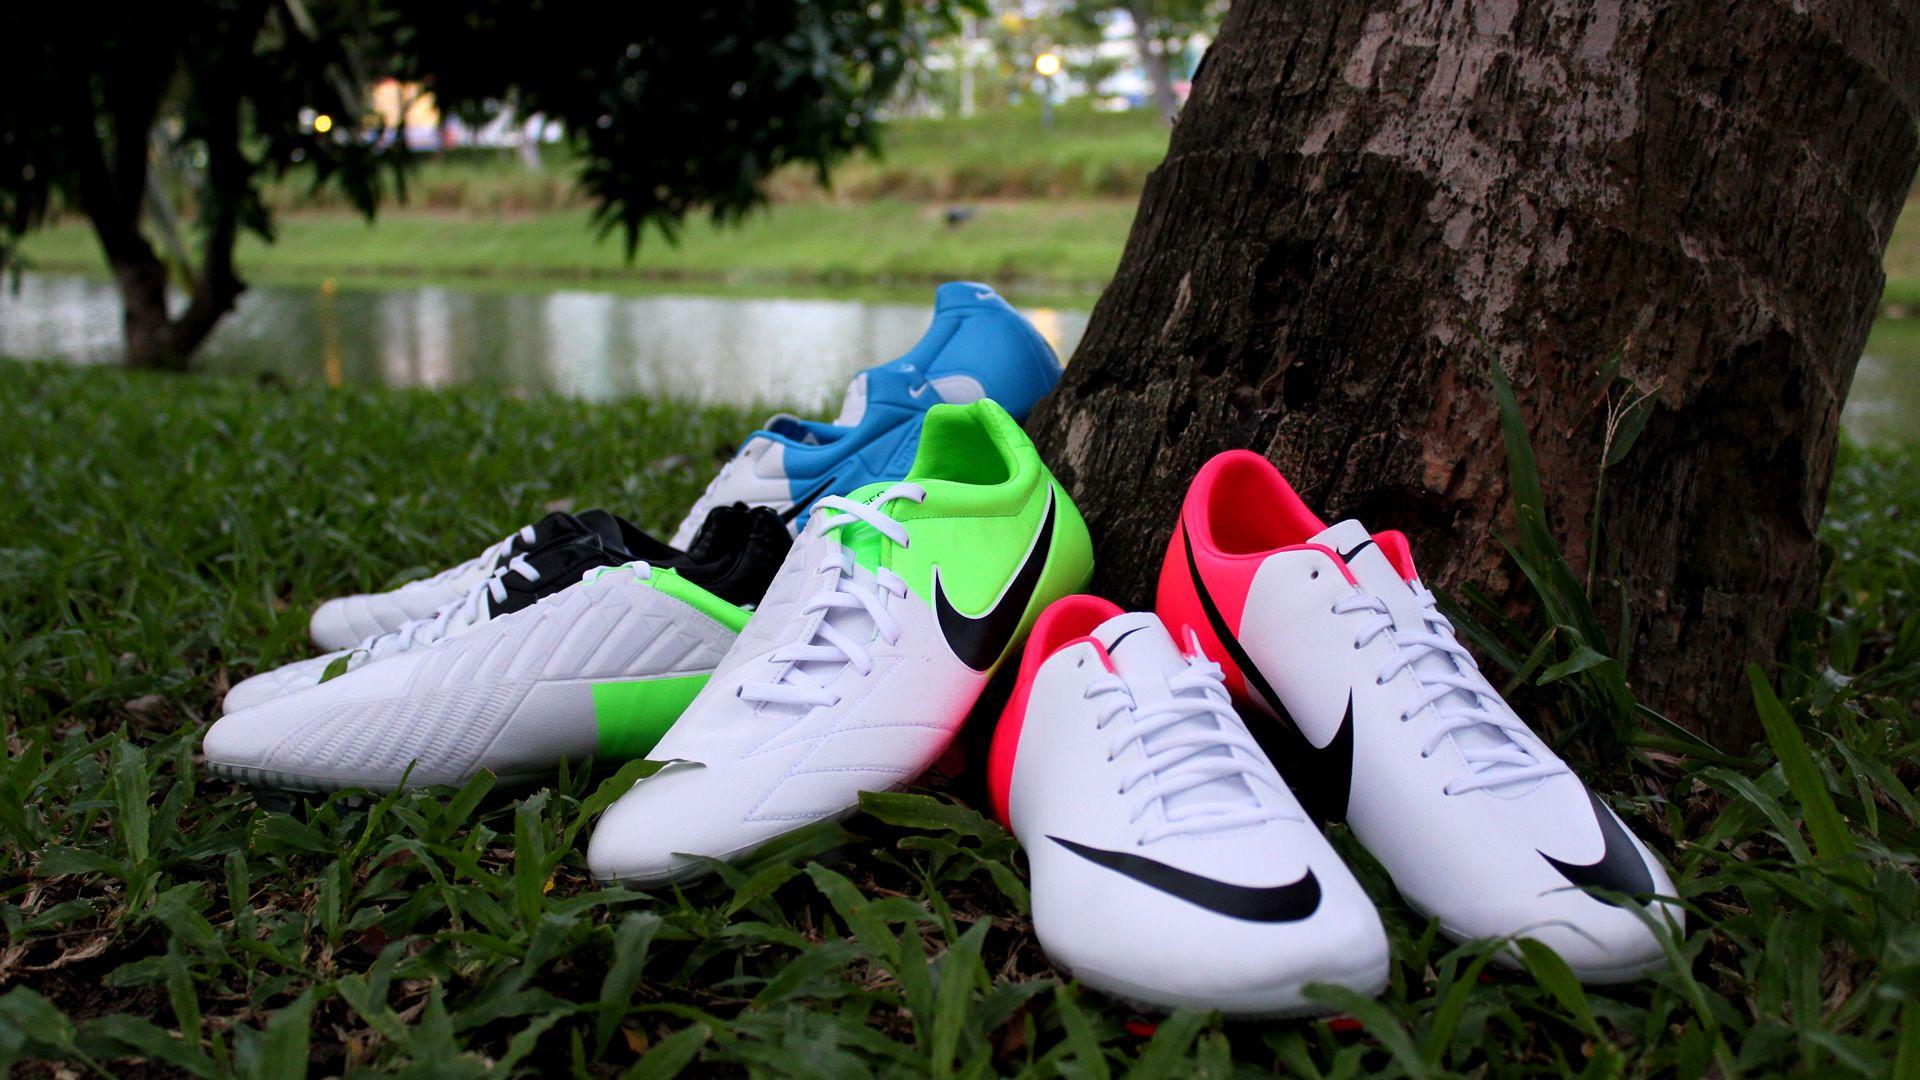 Football 123 Hd Wallpaper Nike Soccer Shoes Soccer Shoes Shoes Wallpaper